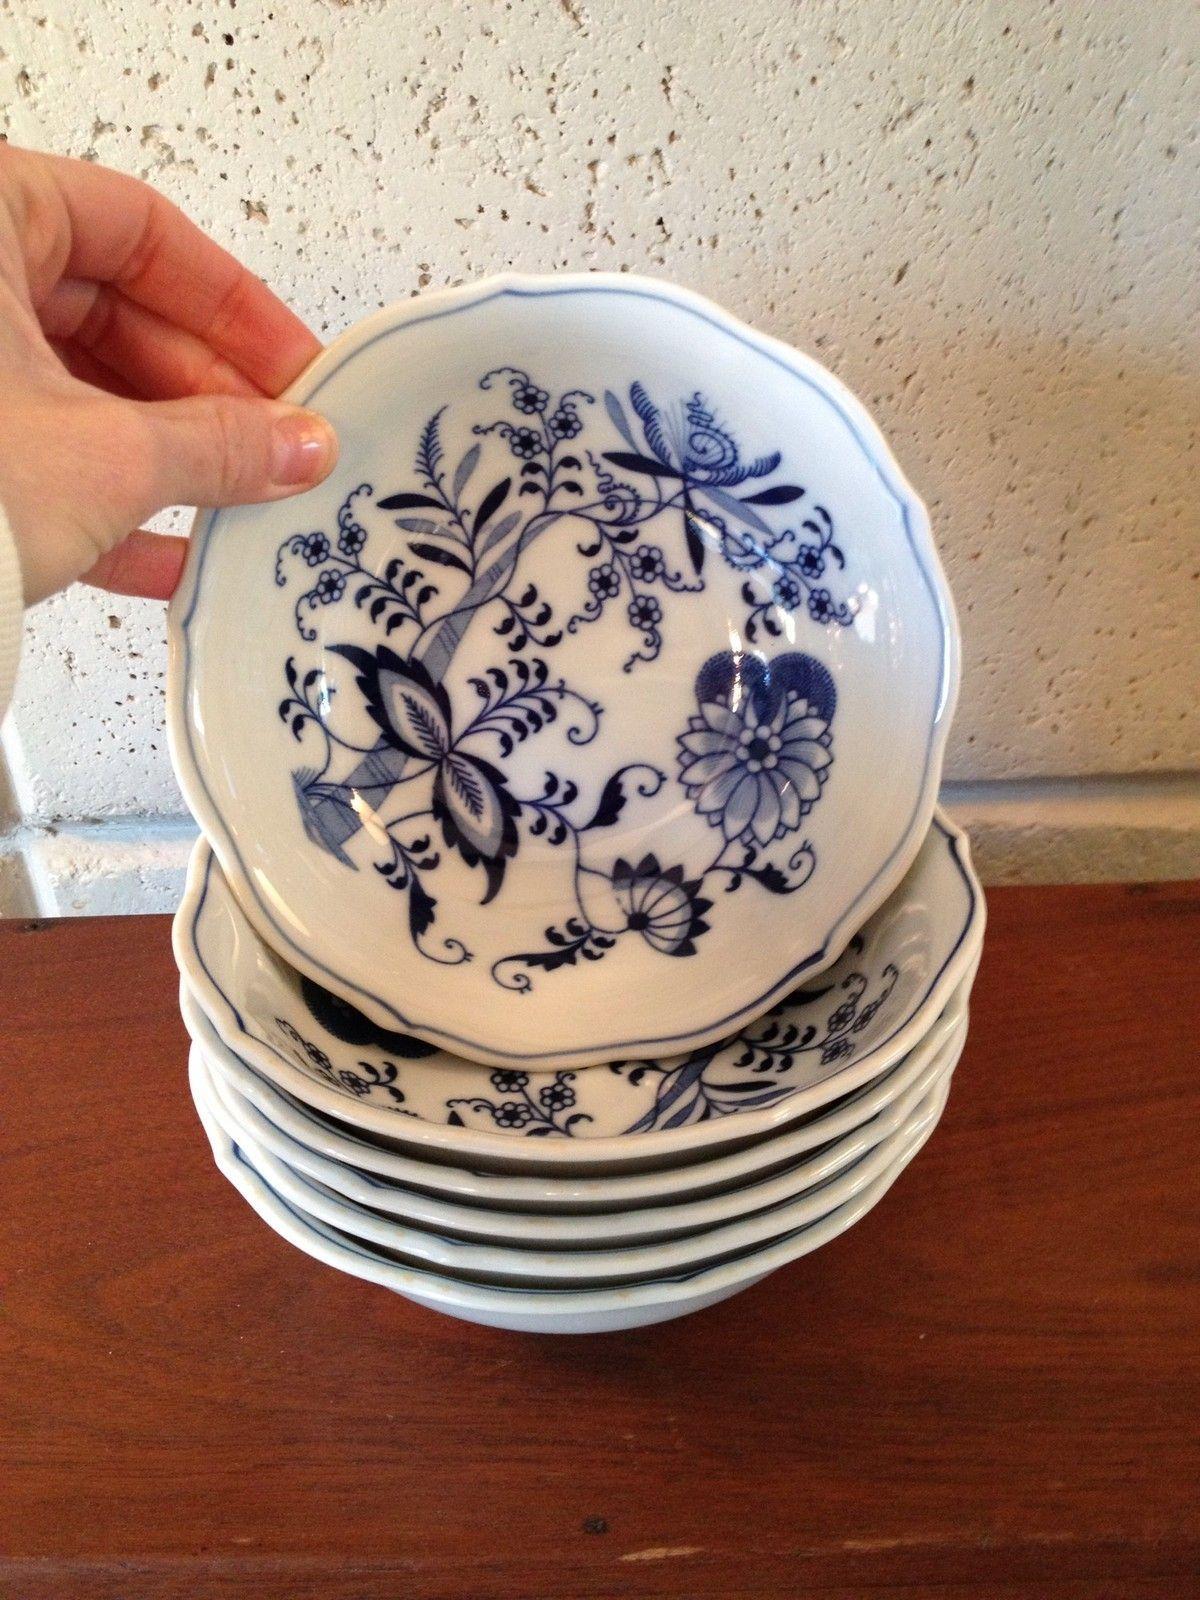 Blue Danube China Japan Set 6 Cereal Bowls 6\  Mint Condition | eBay & Blue Danube China Japan Set 6 Cereal Bowls 6\